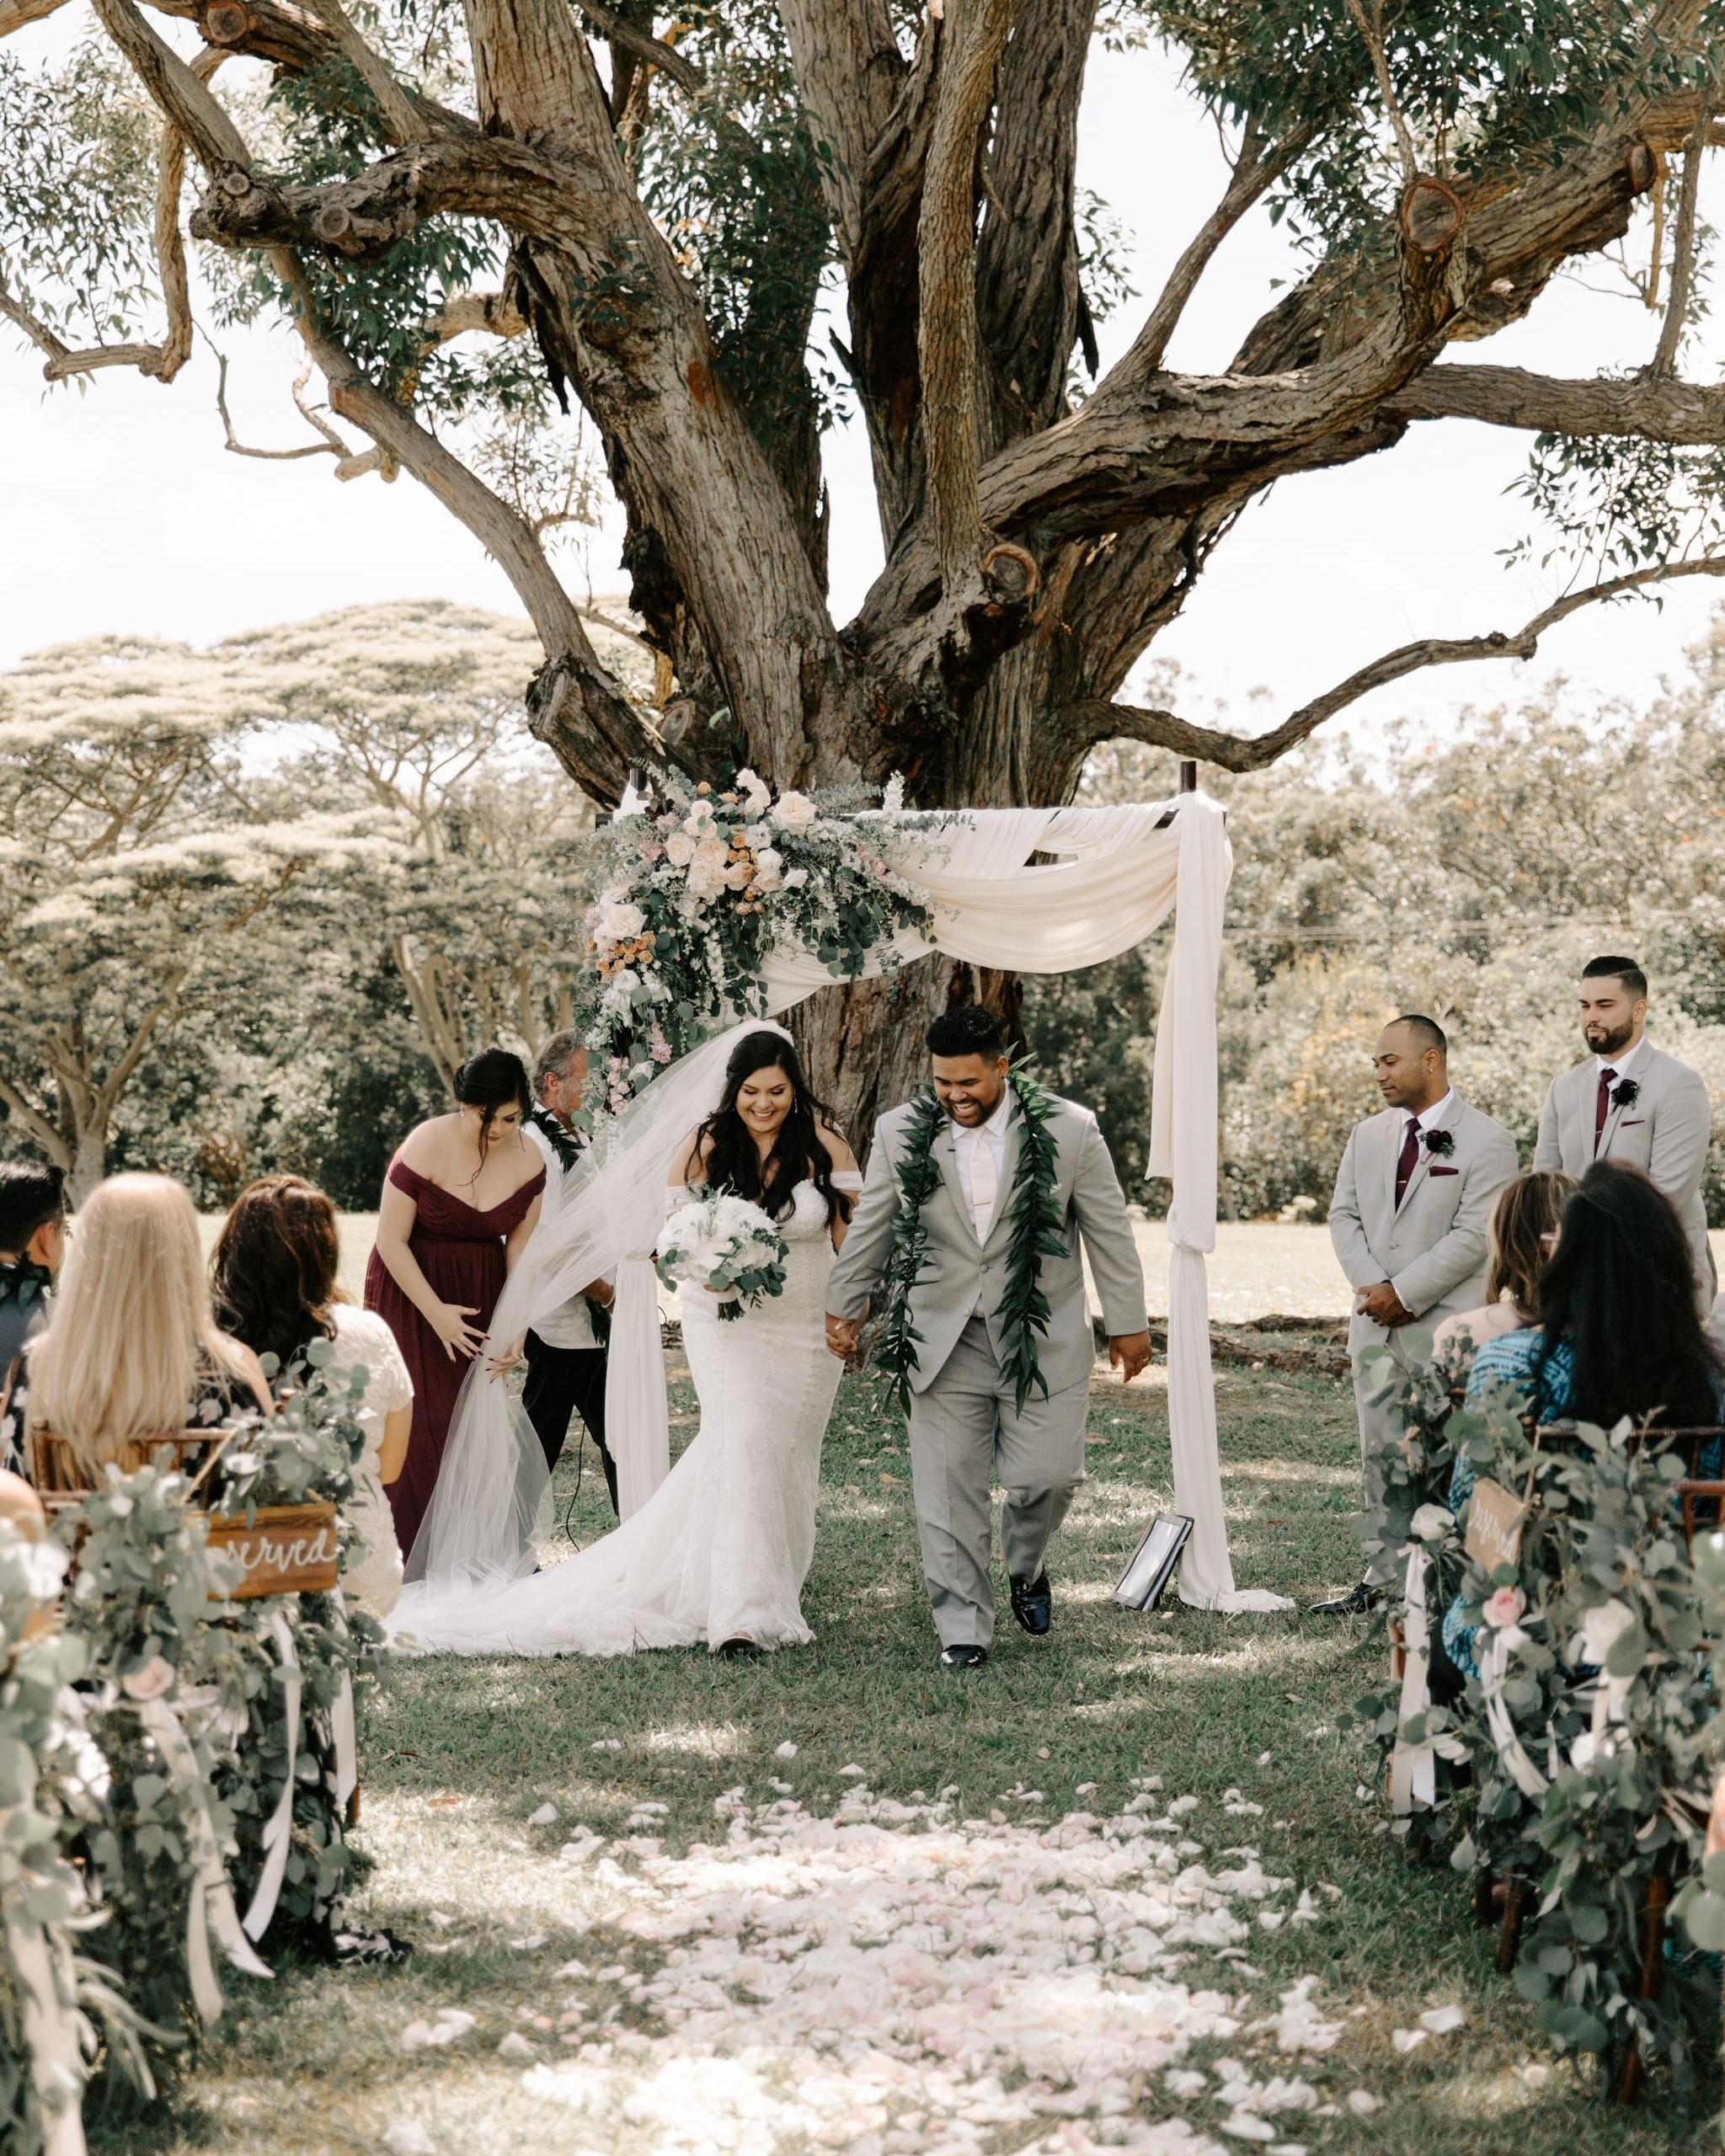 Sunset+Ranch+Hawaii+Wedding+By+Oahu+Wedding+Photographer+Desiree+Leilani